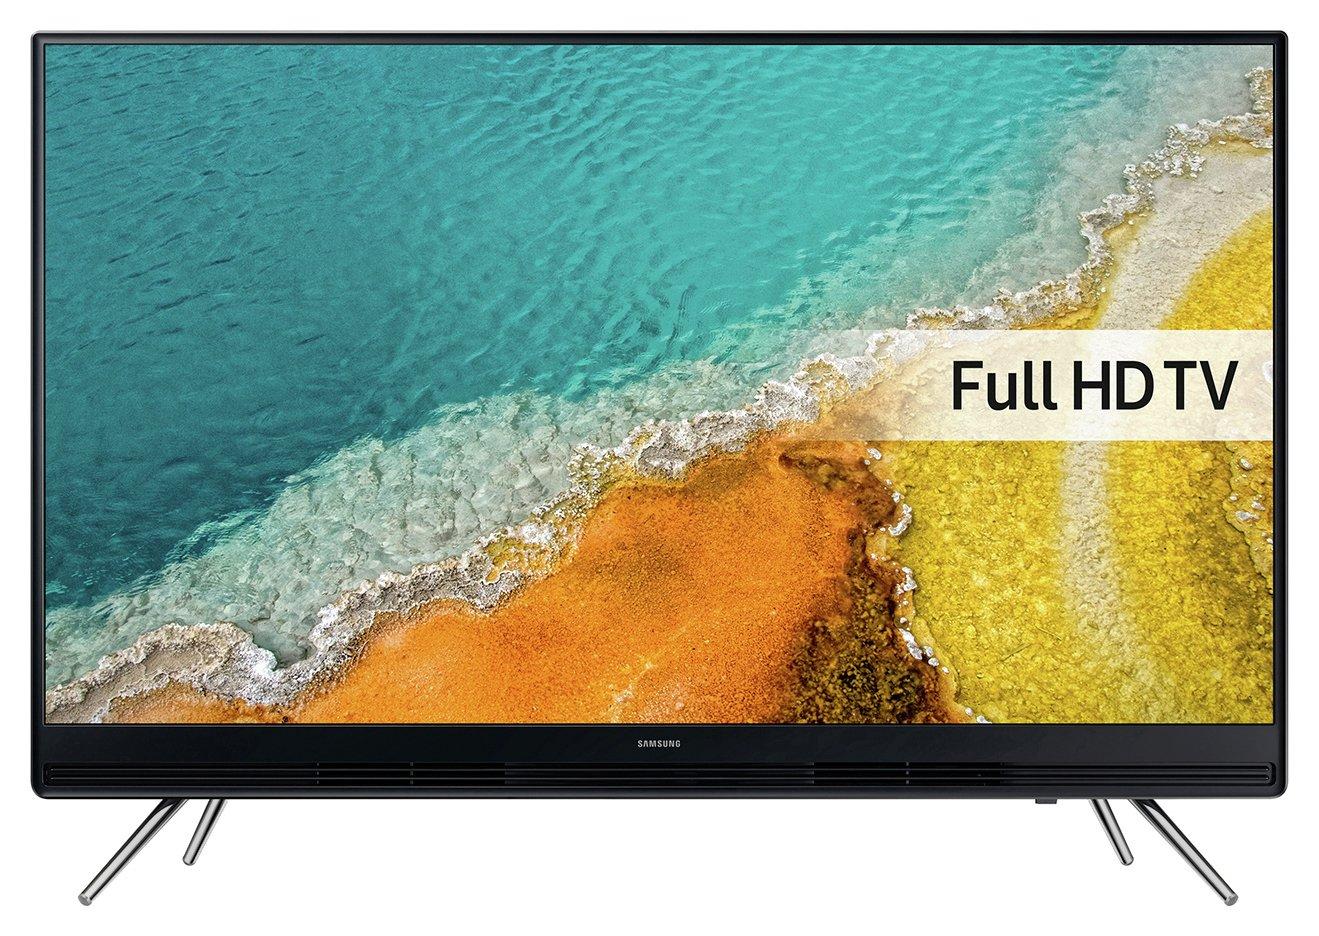 Image of Samsung UE40K5100 40 Inch Full HD LED TV.